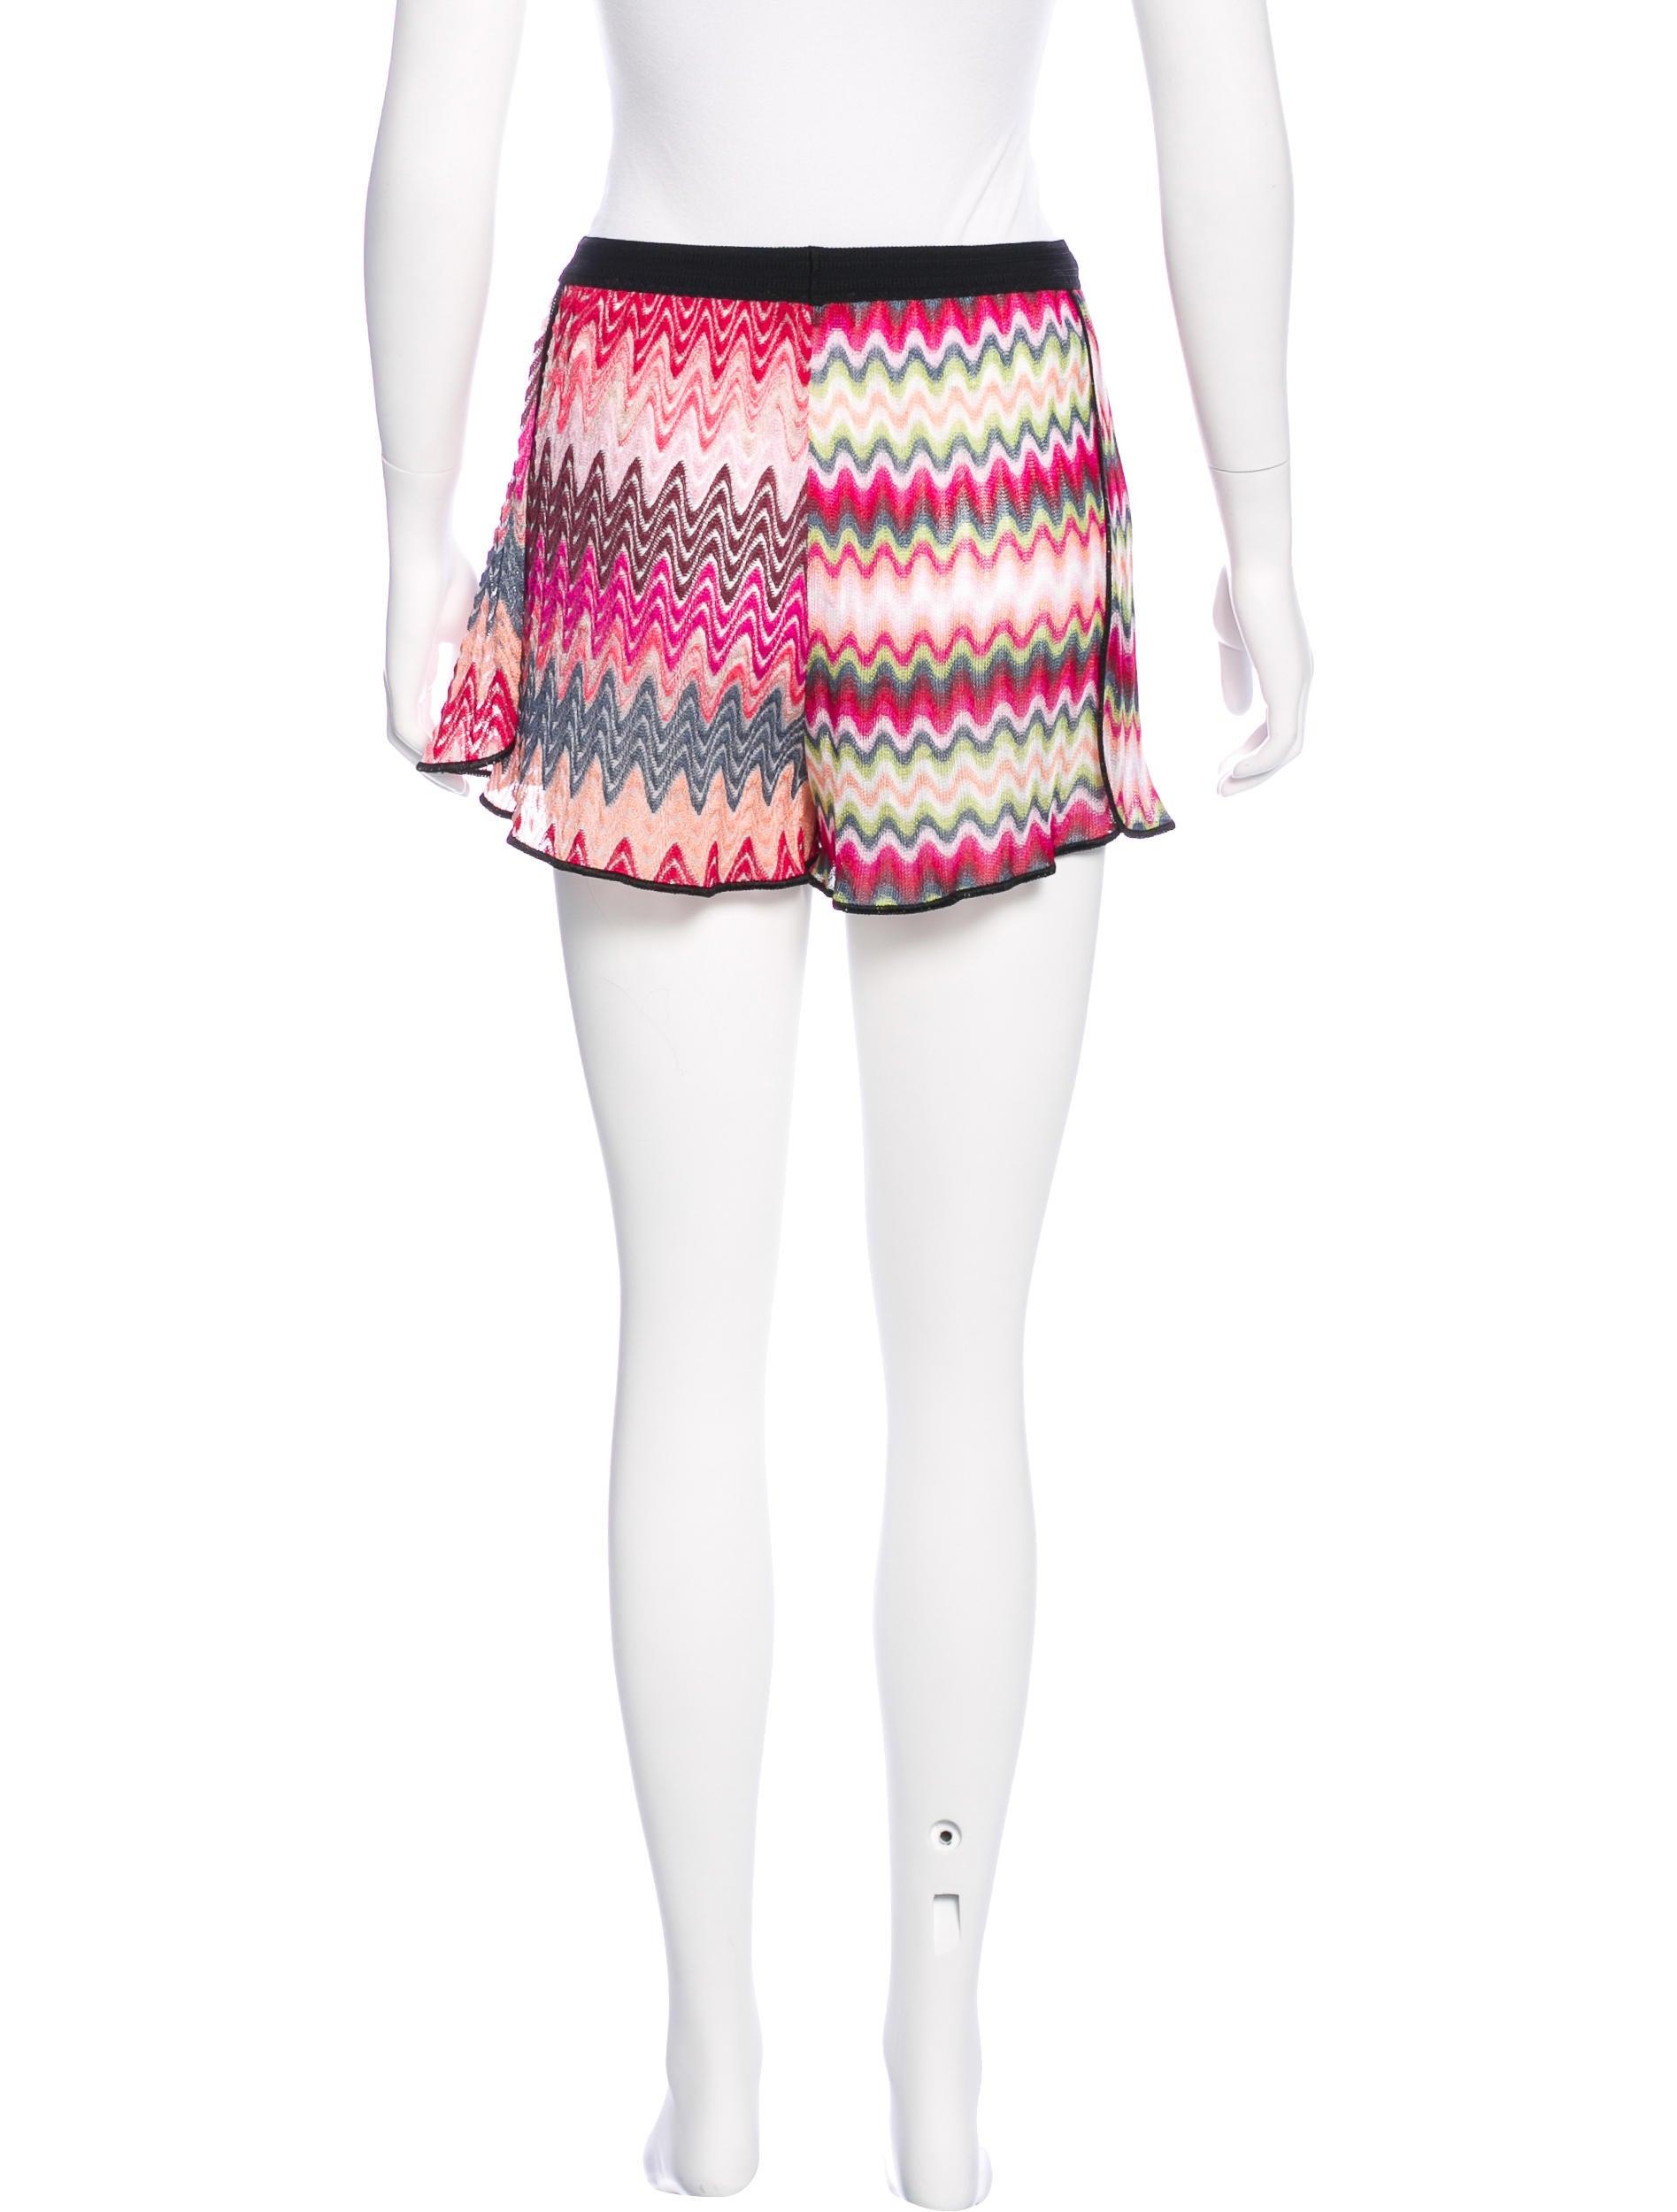 Knit Shorts Pattern : Missoni Stretch Knit Mini Shorts - Clothing - MIS41743 The RealReal